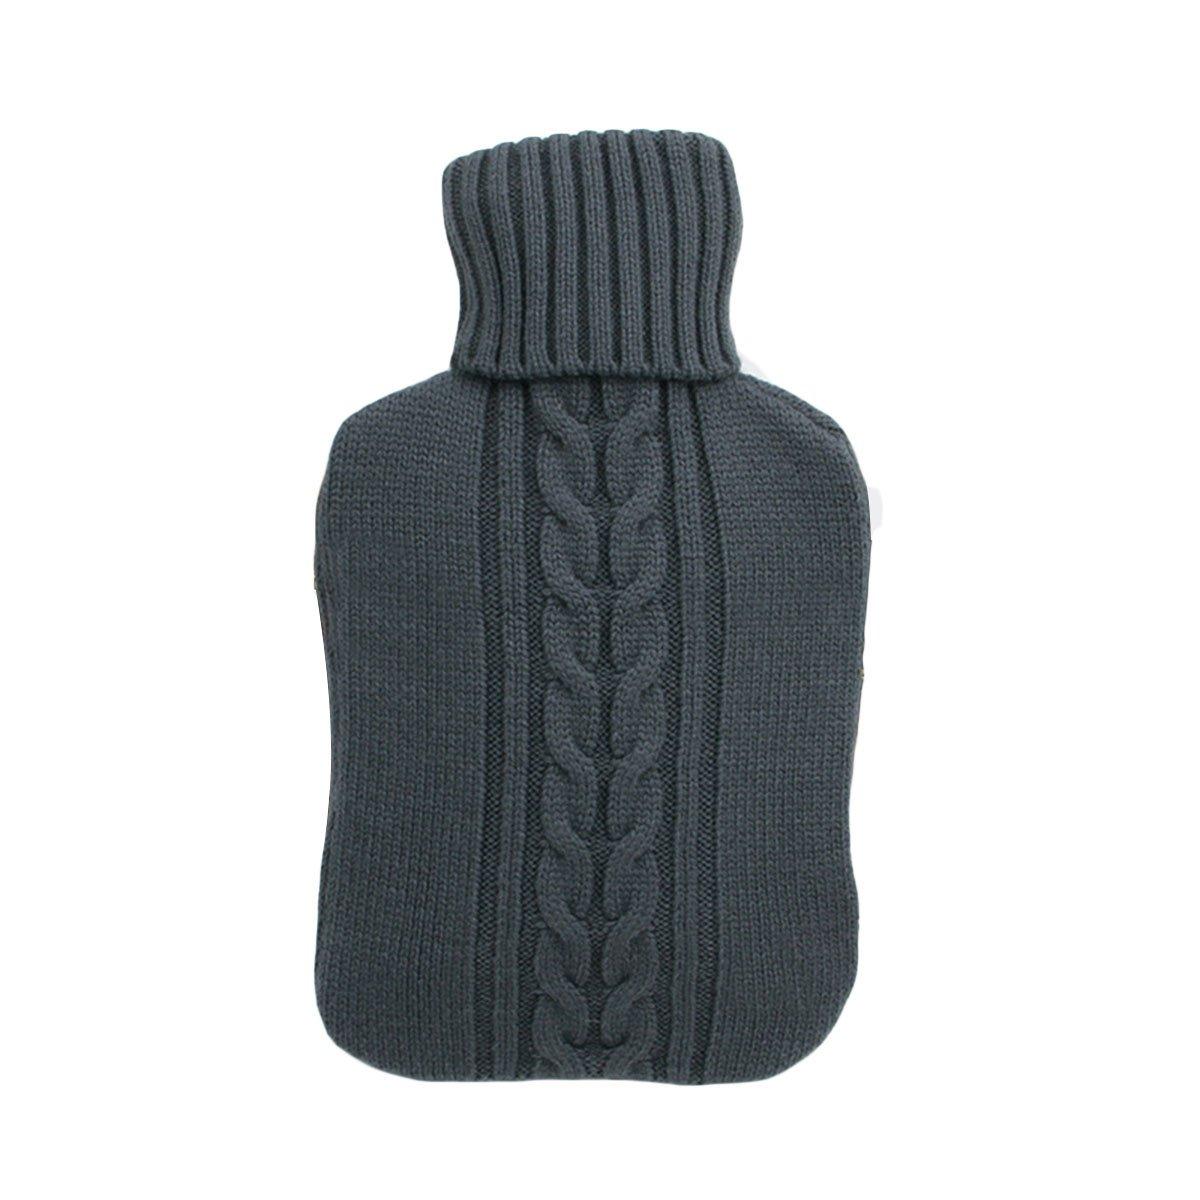 gris VORCOOL Funda de punto suave 2L Premium para bolsa de botella de agua caliente